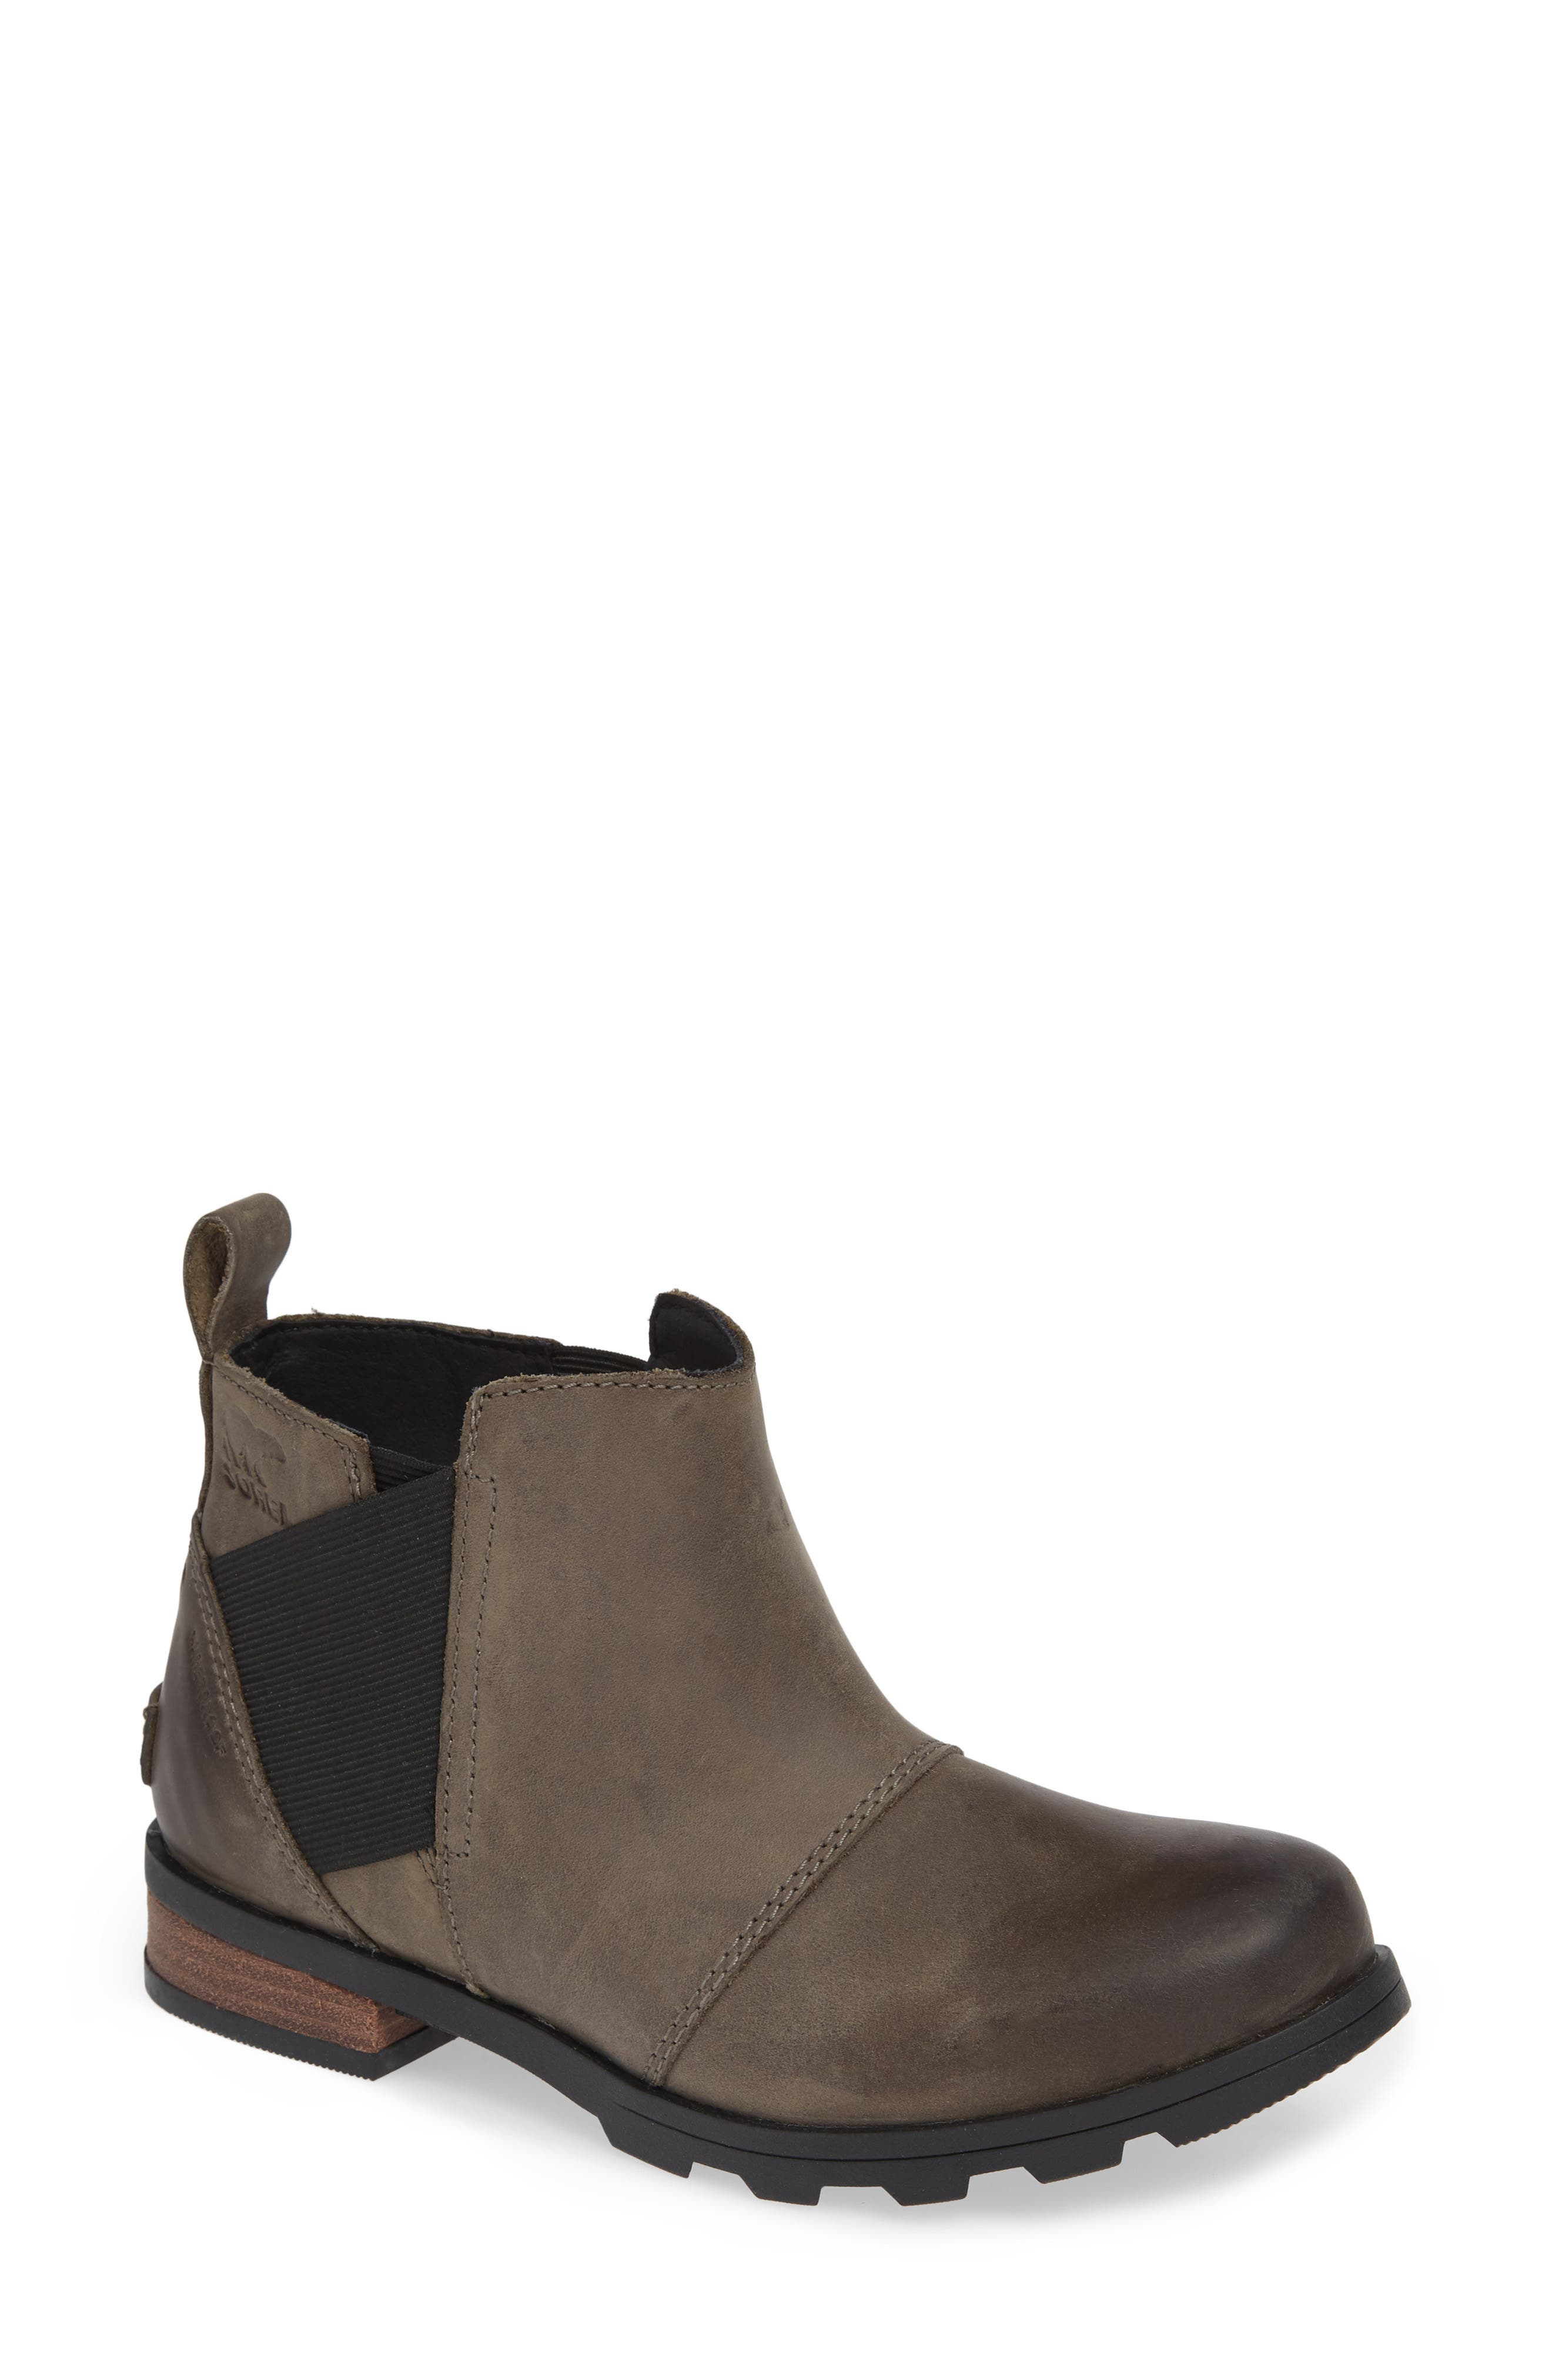 Emelie Waterproof Chelsea Boot,                             Main thumbnail 1, color,